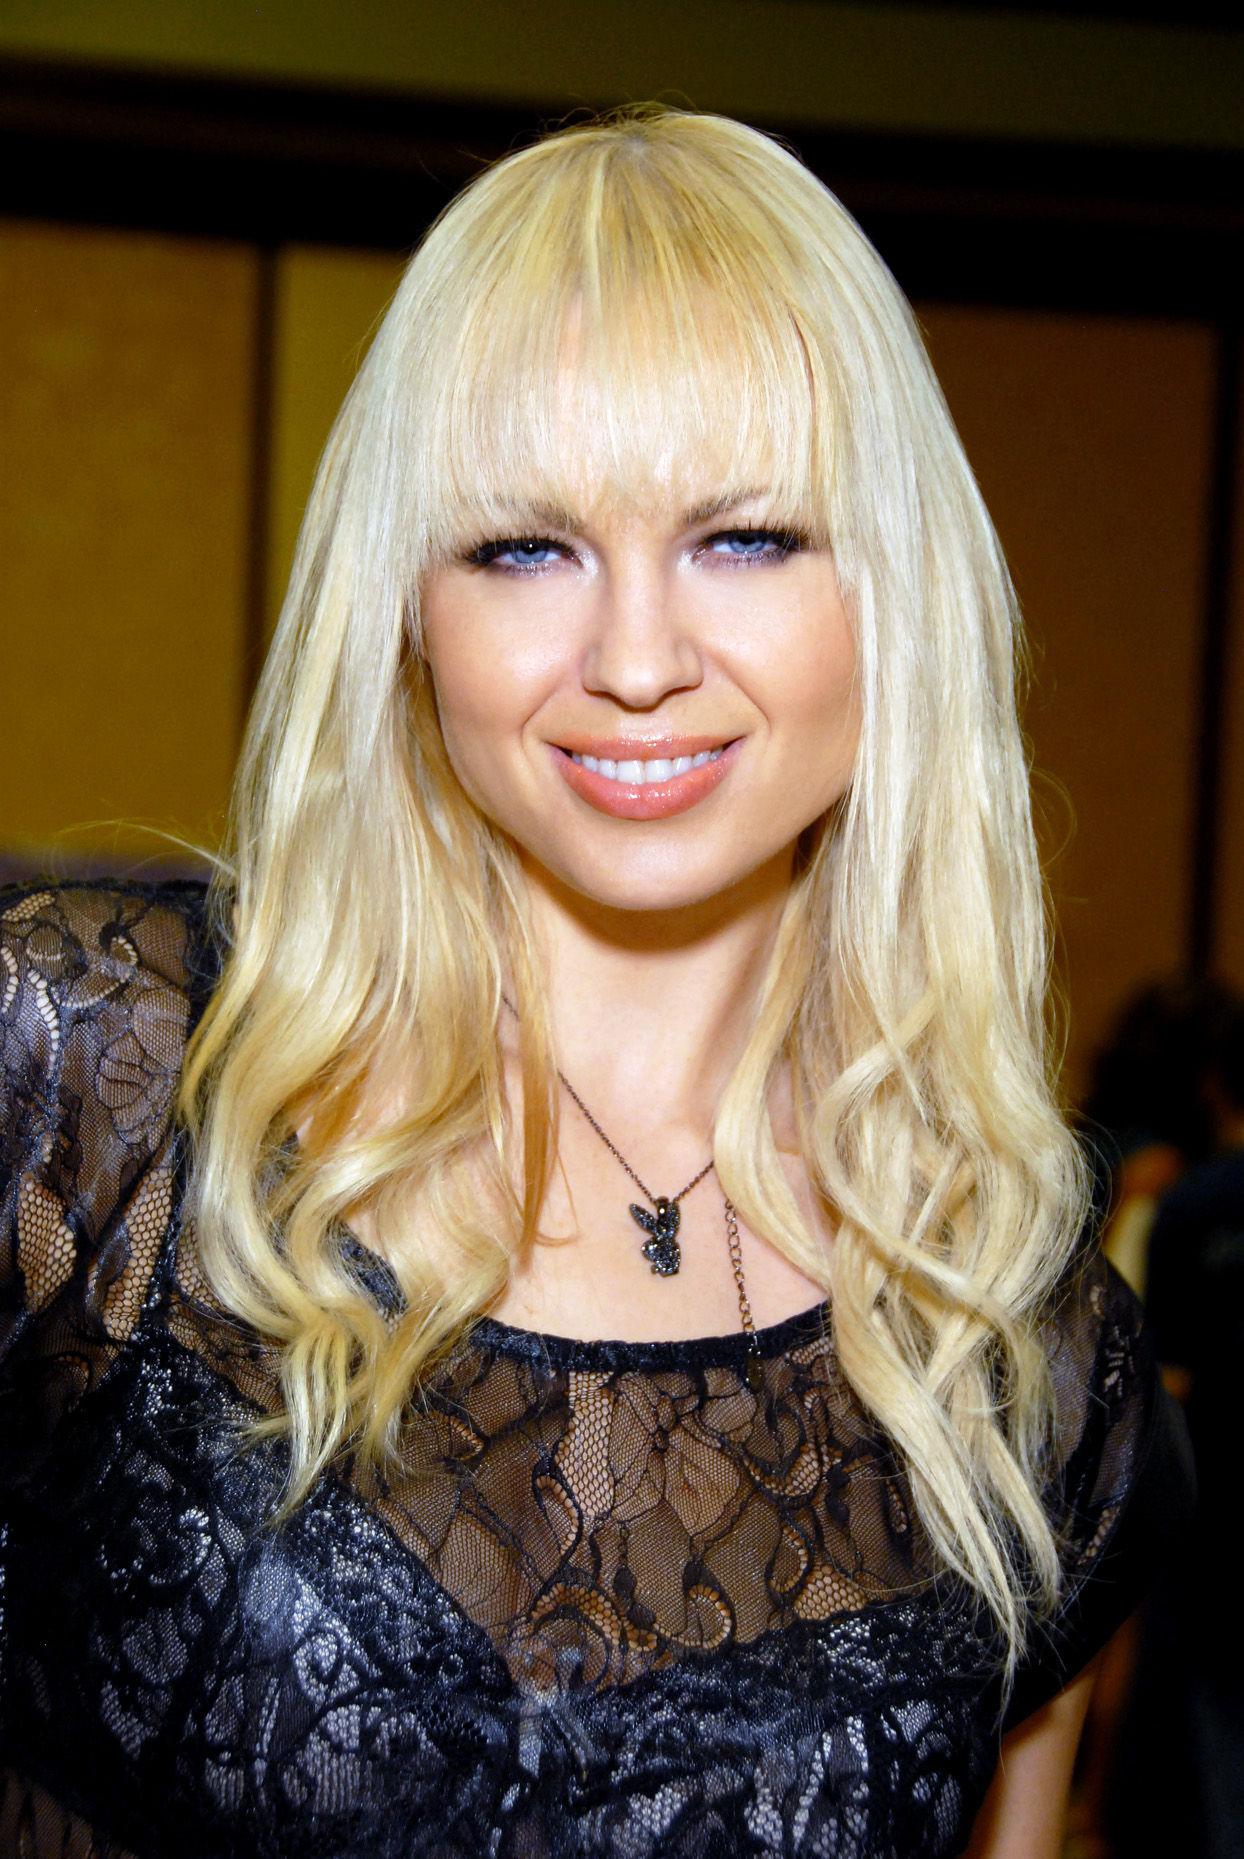 Photo of Irina Voronina: Russian Playboy Playmate